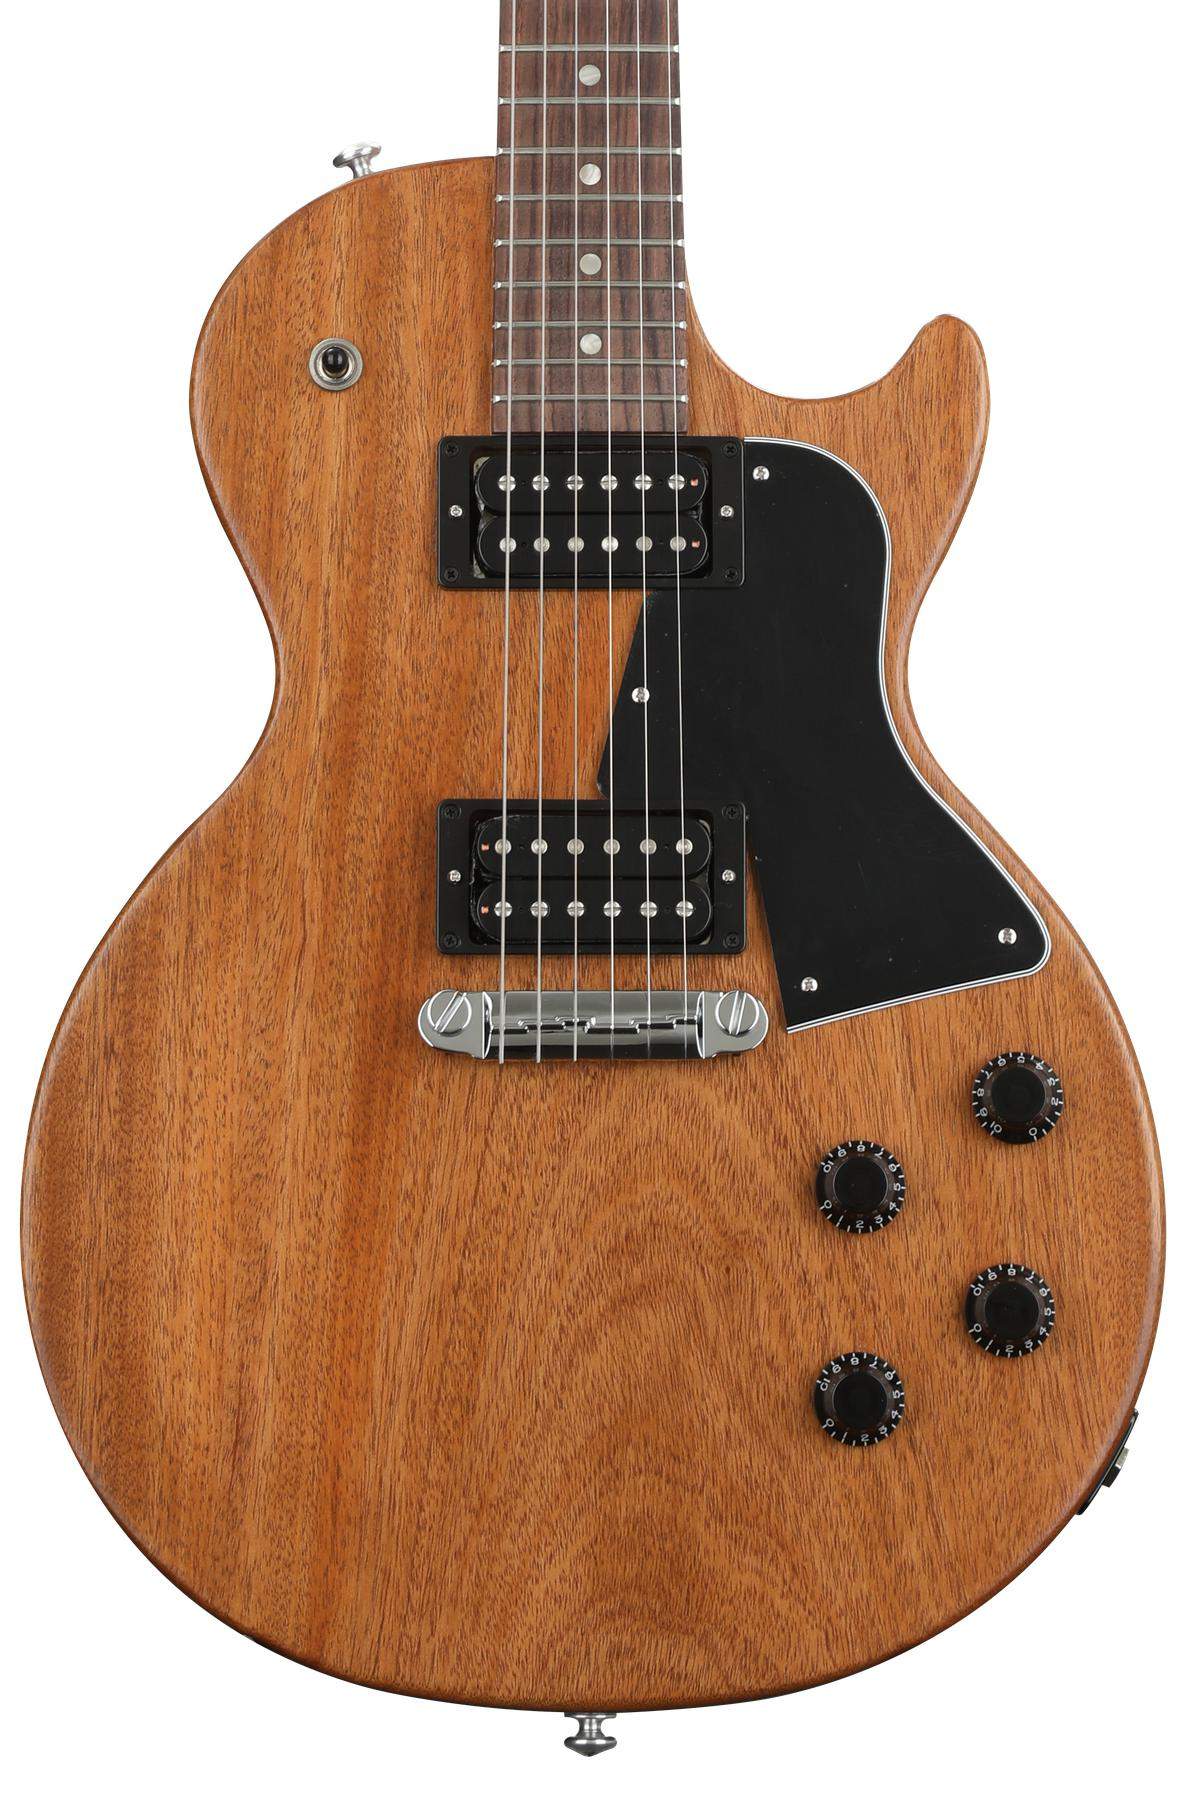 2. Gibson